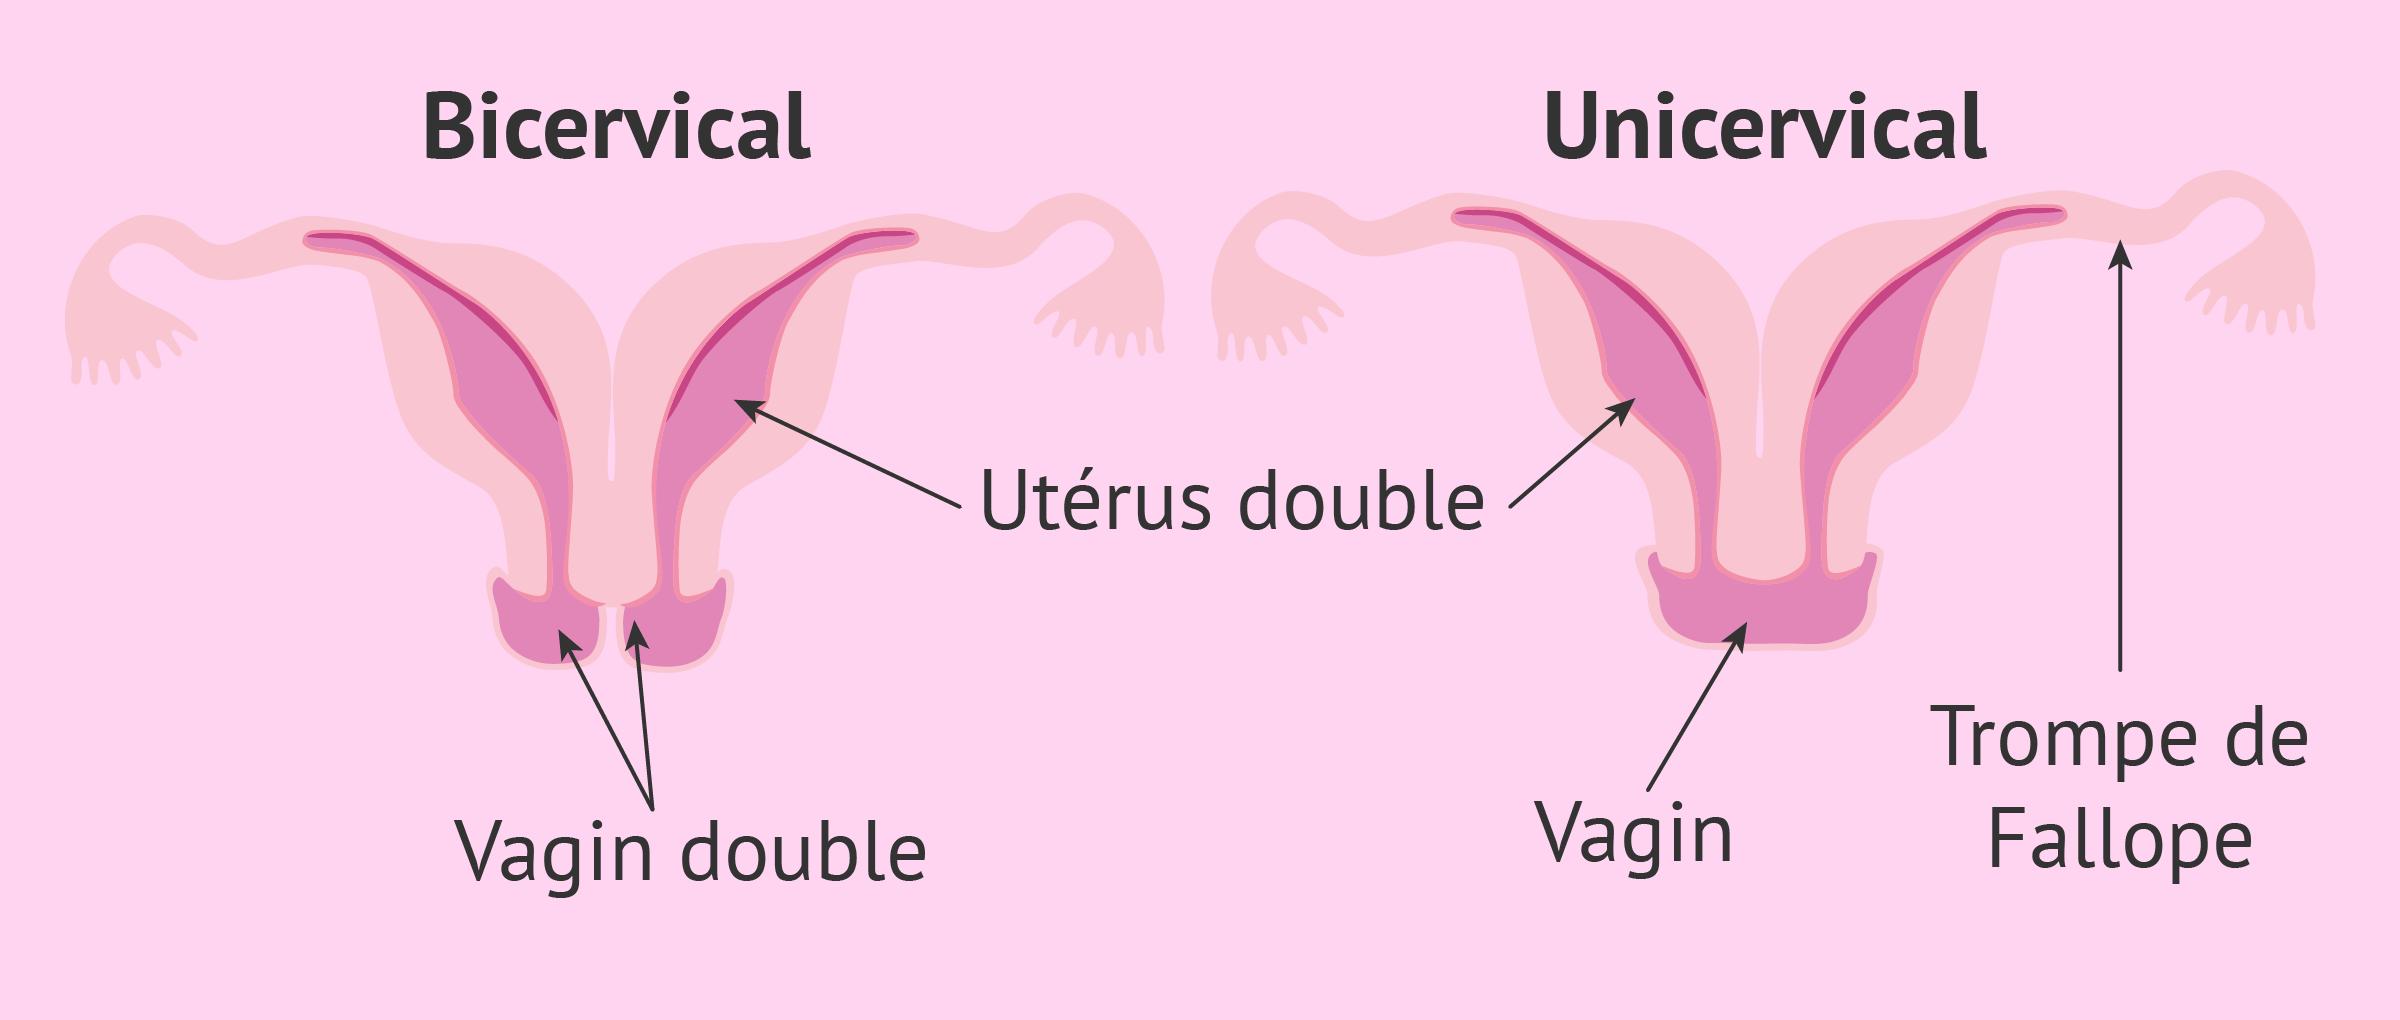 Utérus didelphe